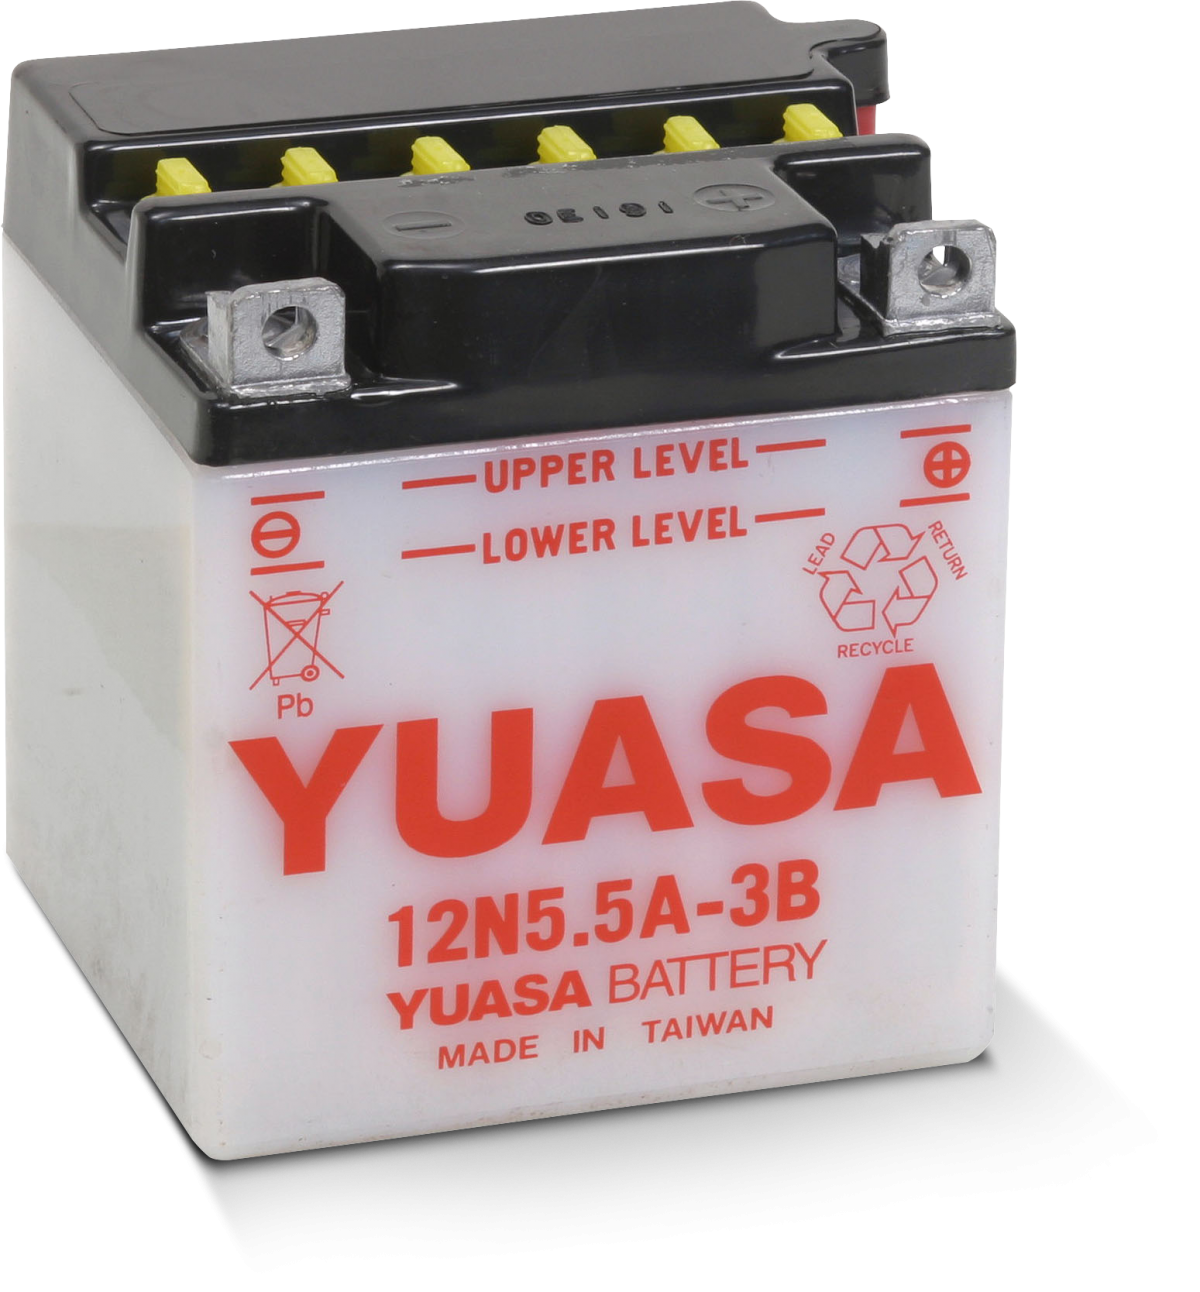 12N5.5A-3B Battery